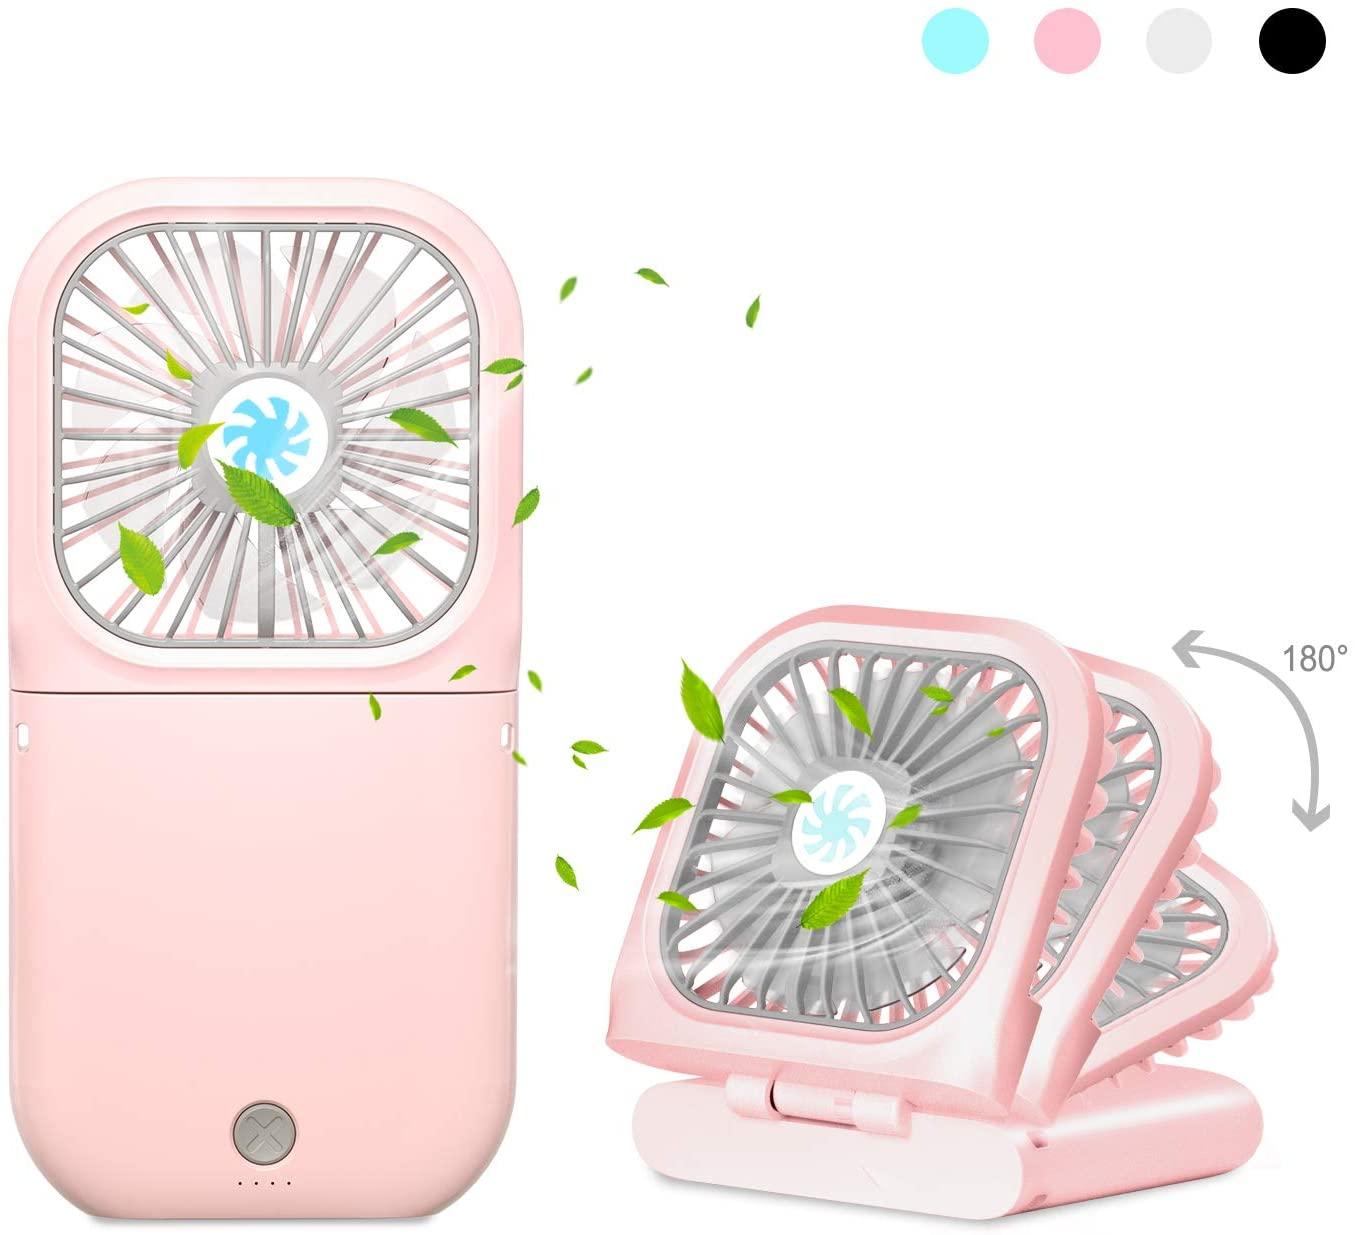 AIMO Handheld Fan,3000mAh Rechargeable Battery Portable Mini Fan Foldable 3 Speeds Adjustable 4-10 Hours Operated Fan Low Noise Lanyard Girls Kids Women Men Home Office Travel Outdoor Pink